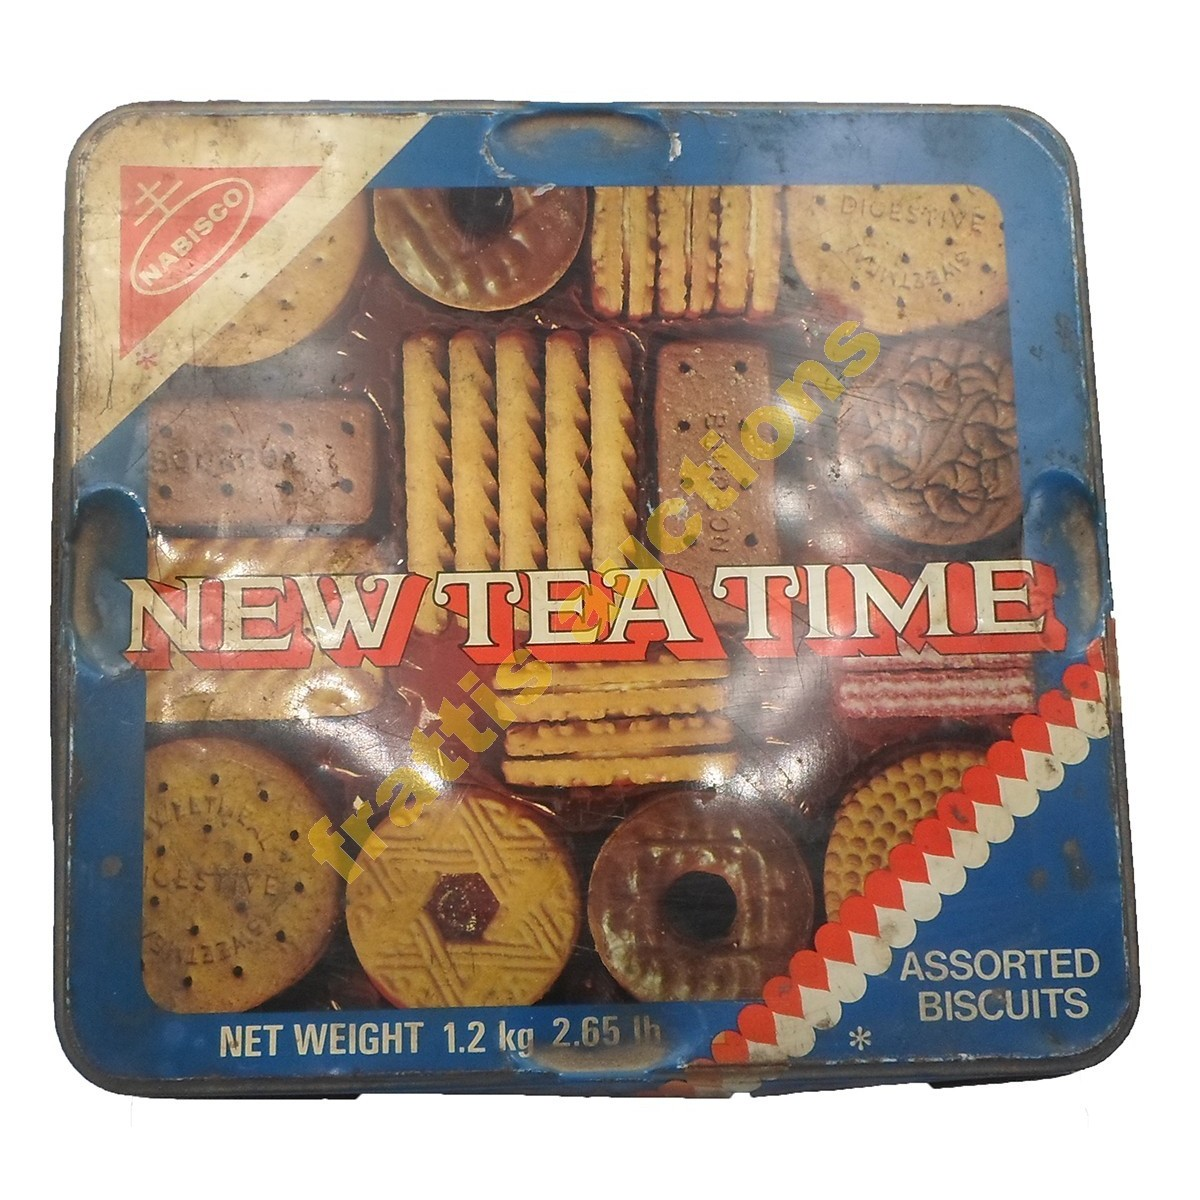 Nabisco, New tea time, England, μεταλλικό κουτί.